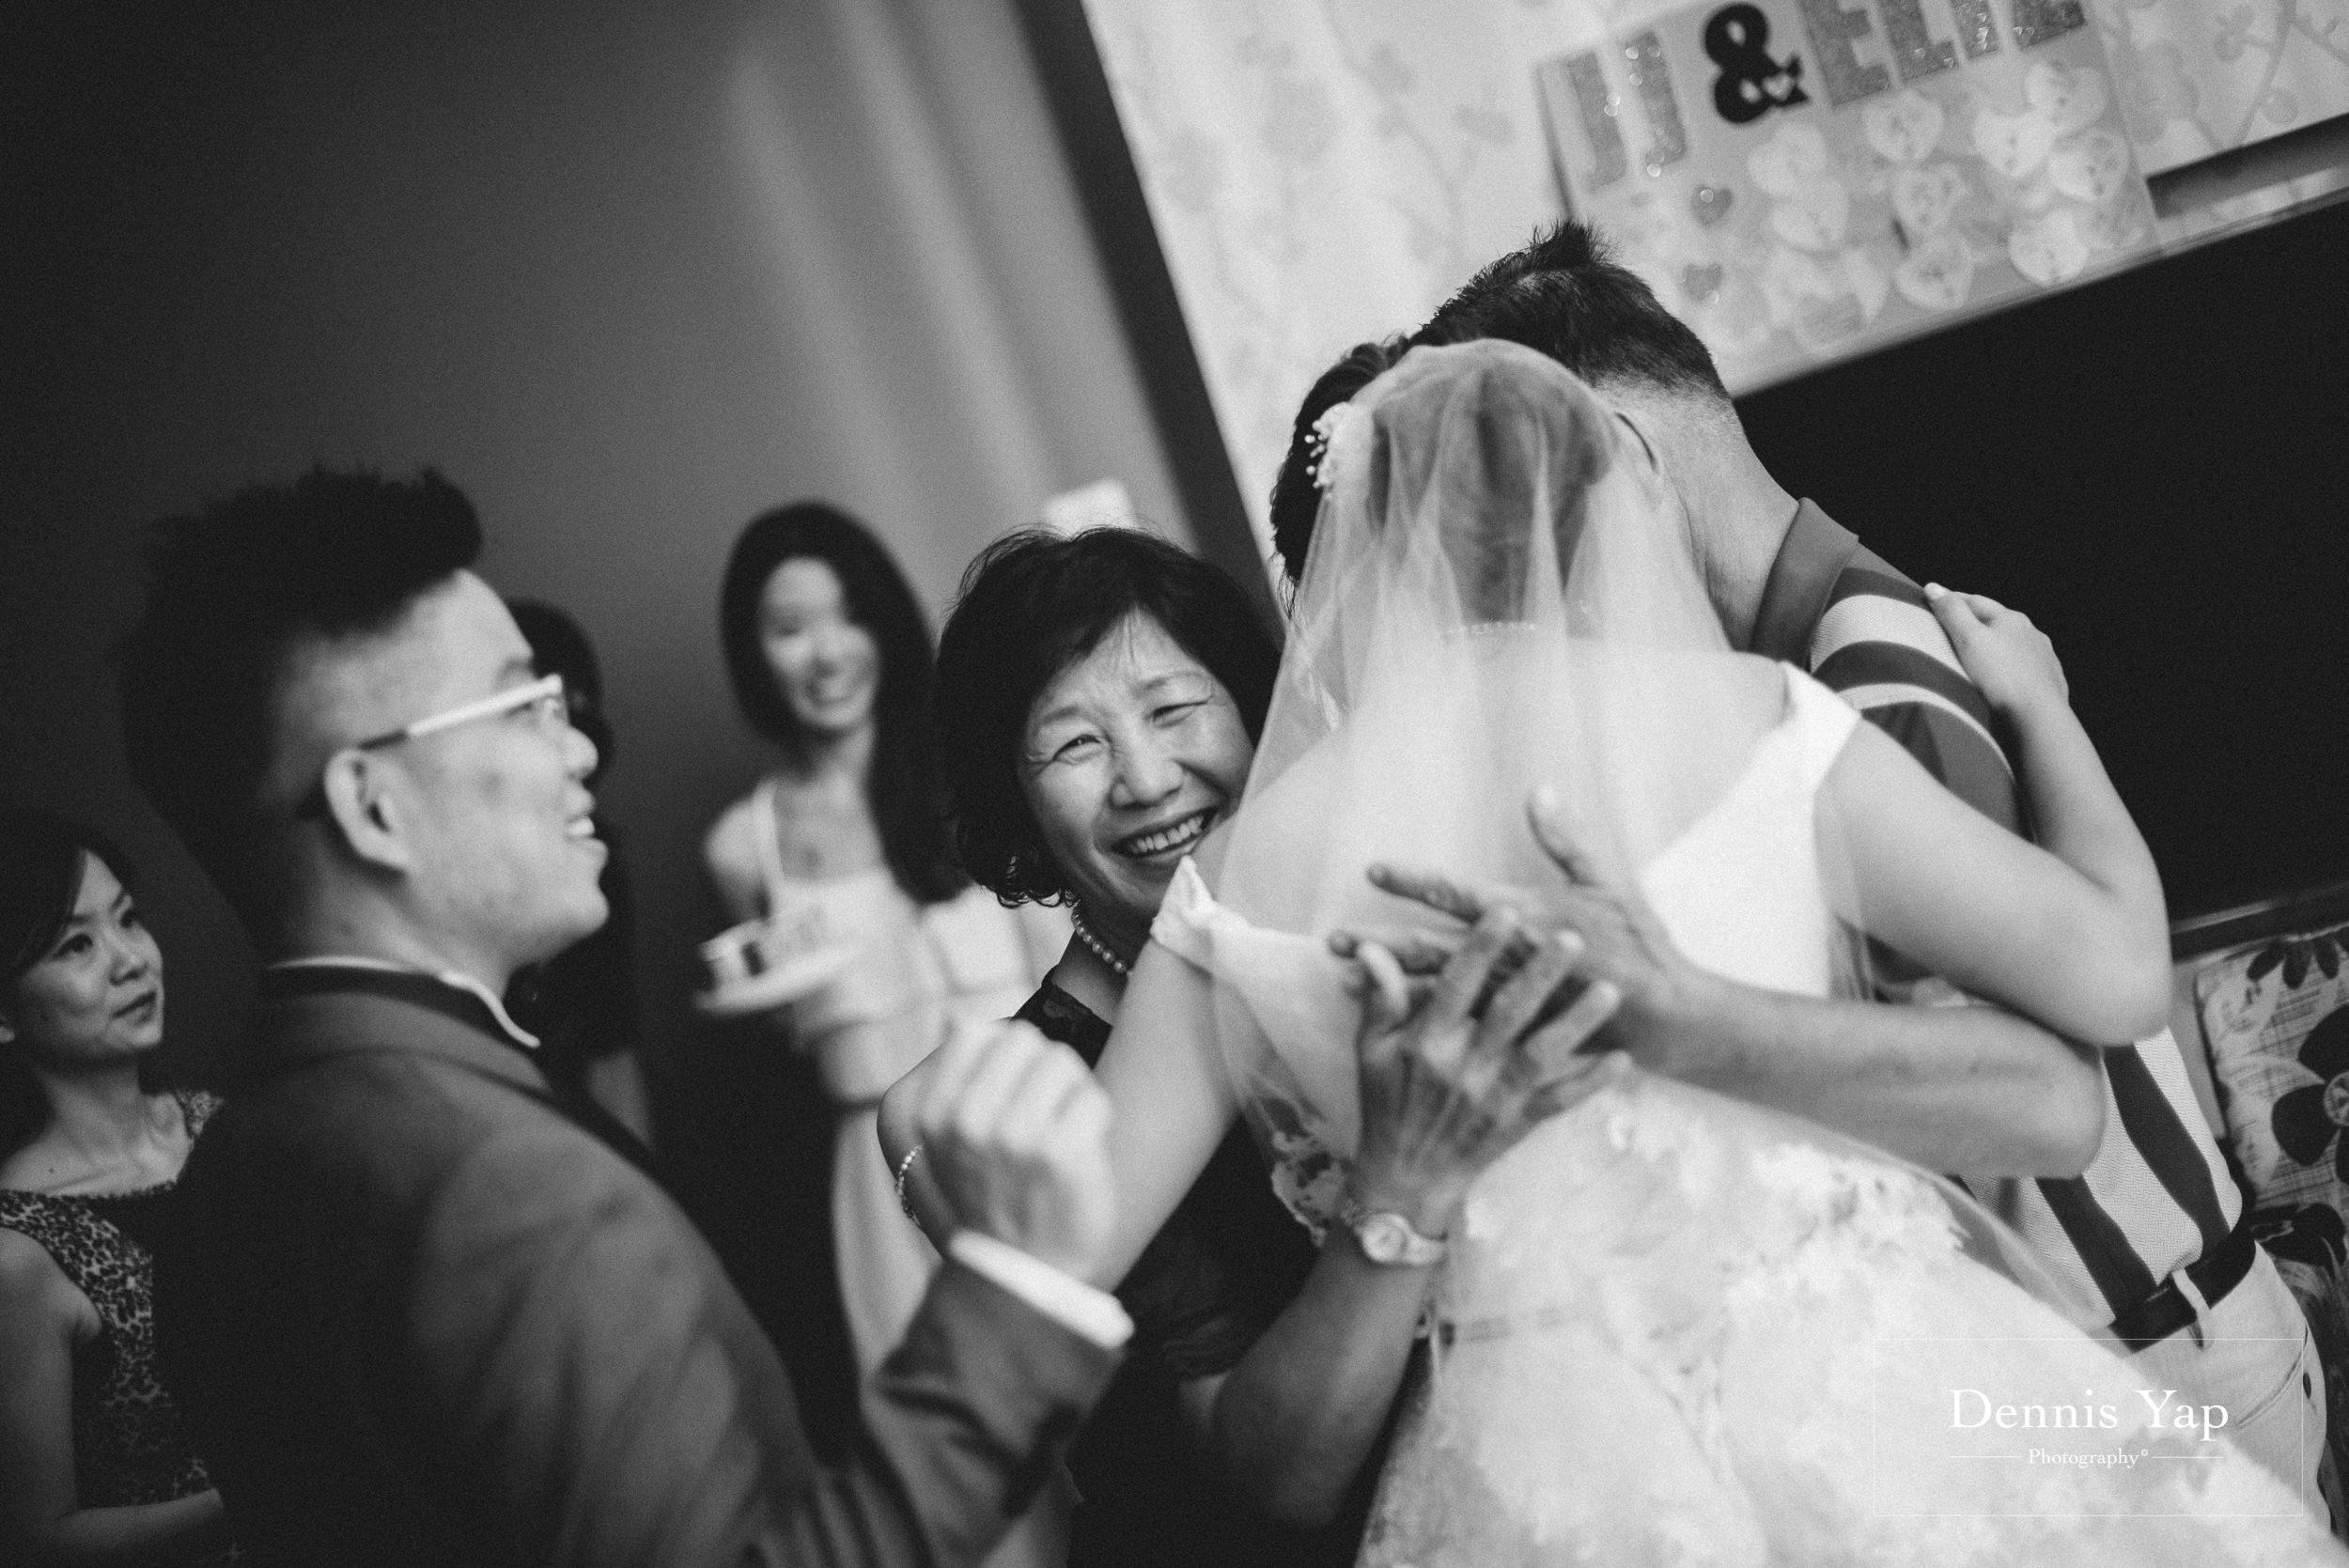 joon keat siew hui wedding day dennis yap malaysia wedding photographer-19.jpg